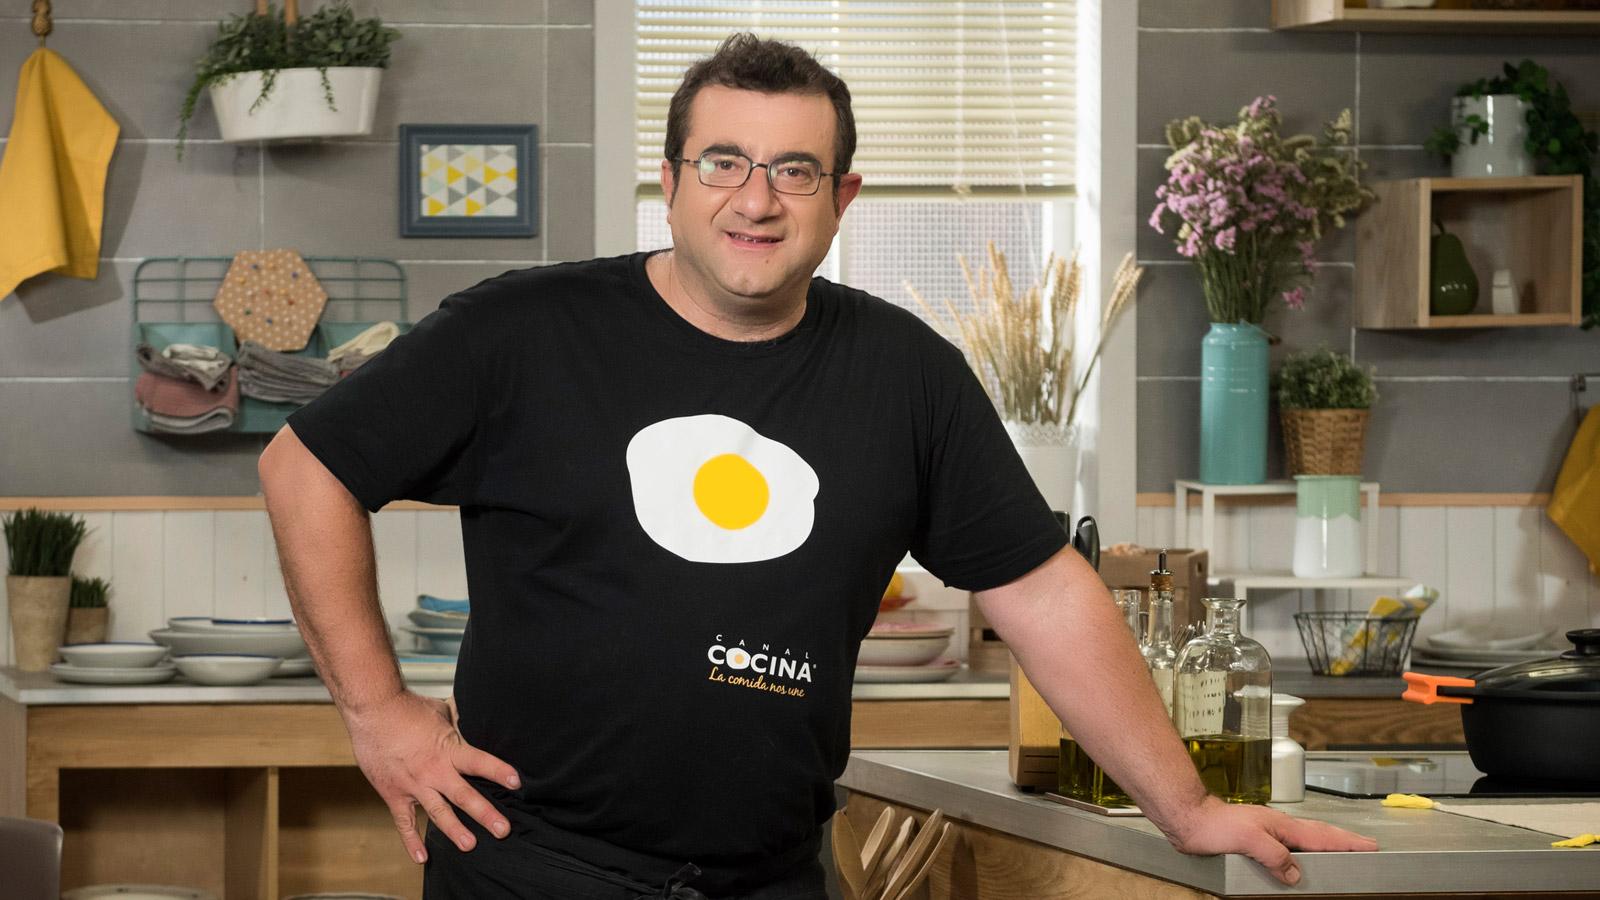 Sergio fern ndez cocineros canal cocina for Cocineros de canal cocina